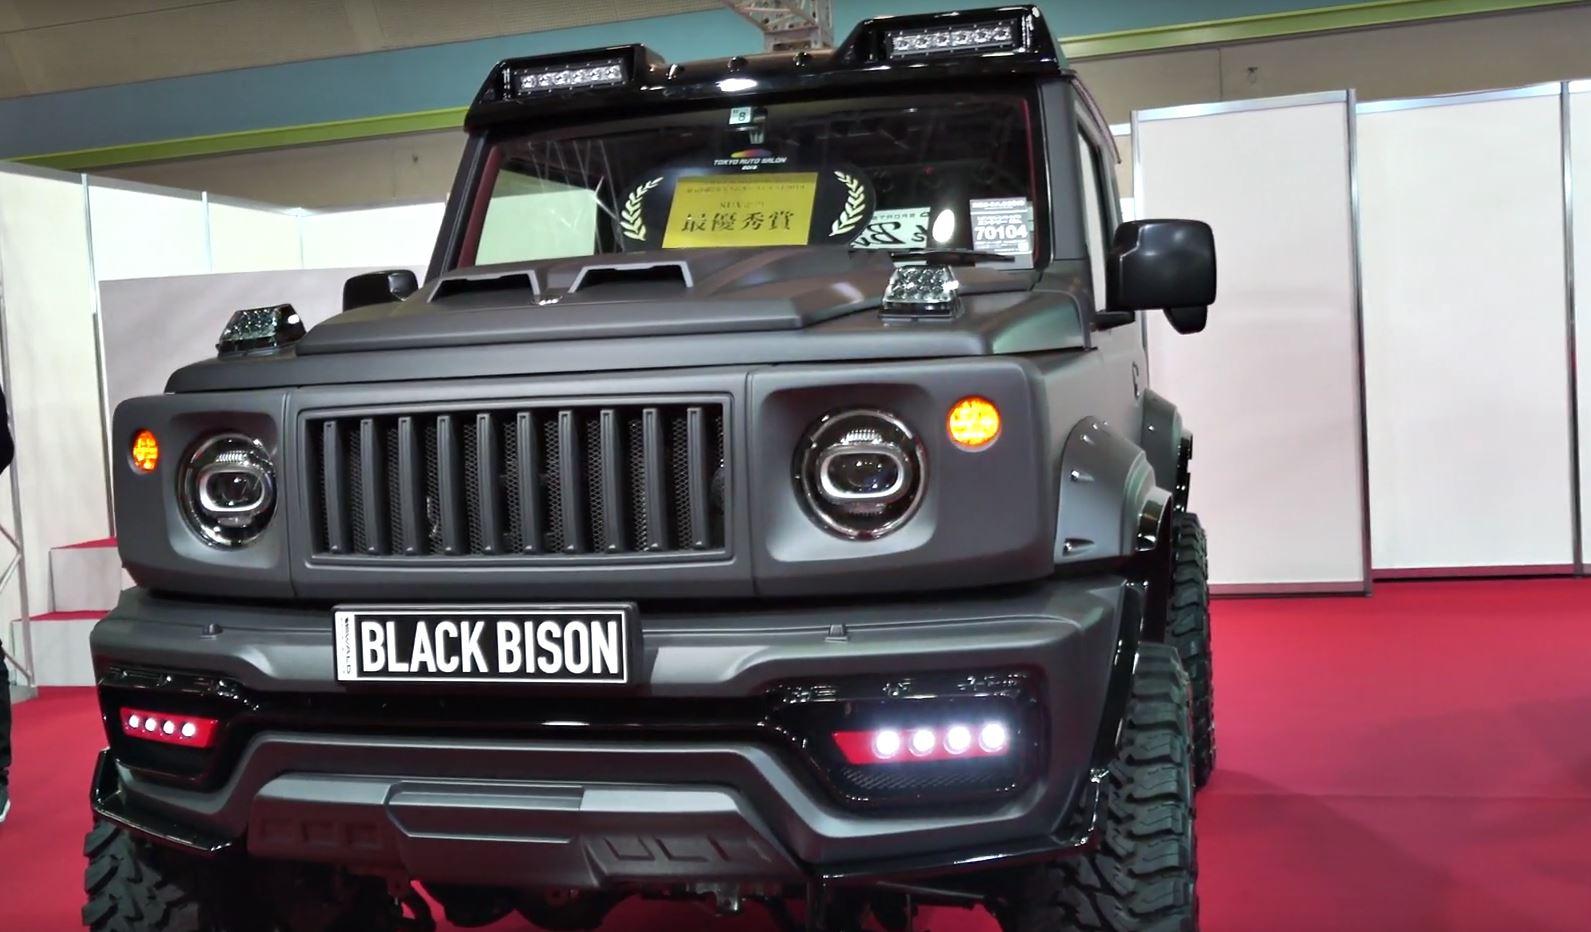 Suzuki Jimny Black Bison by Wald Is Tougher Than a G-Class